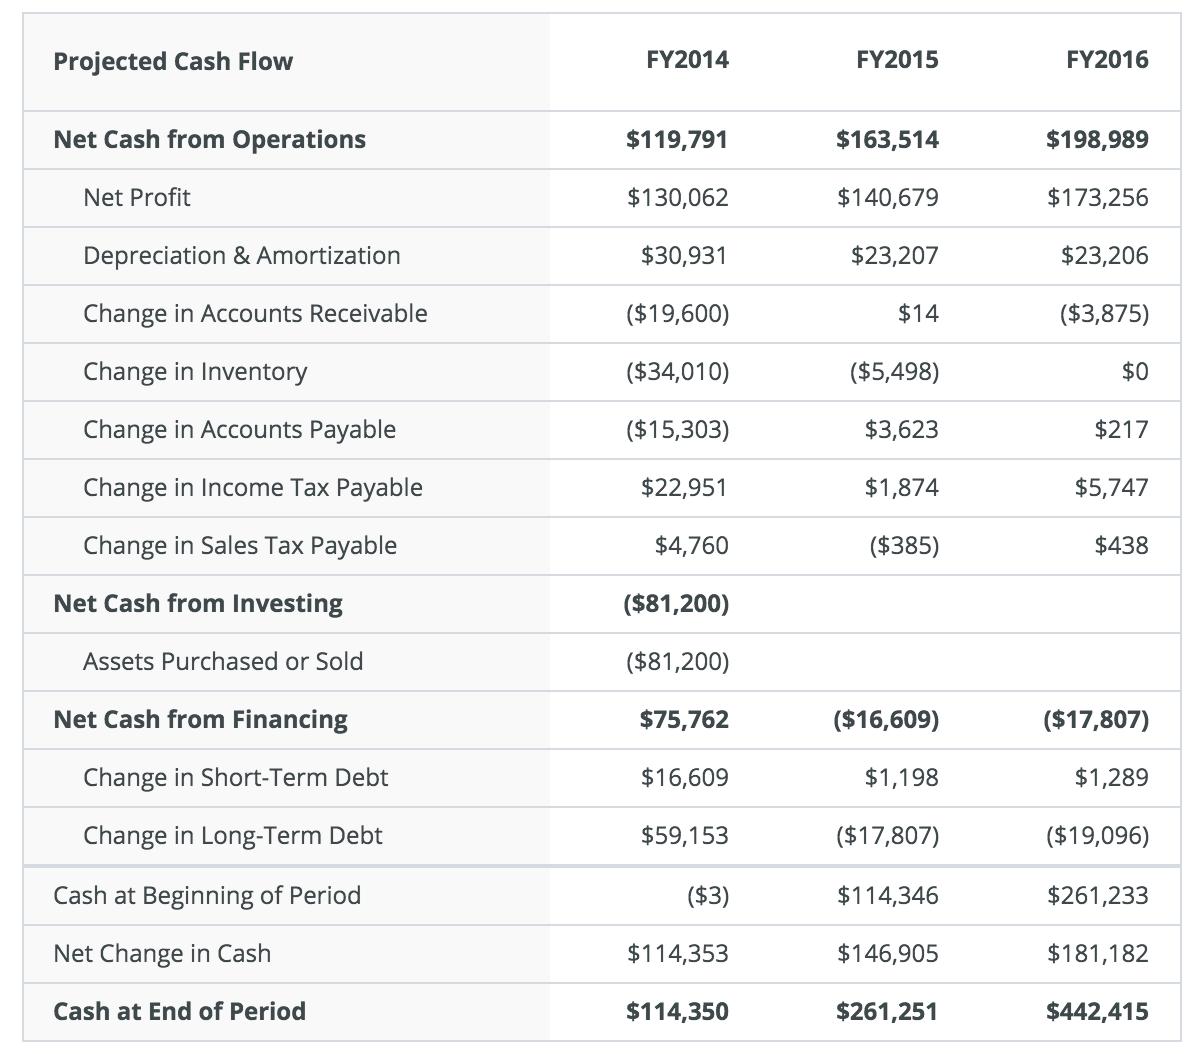 Statements of Cash Flow